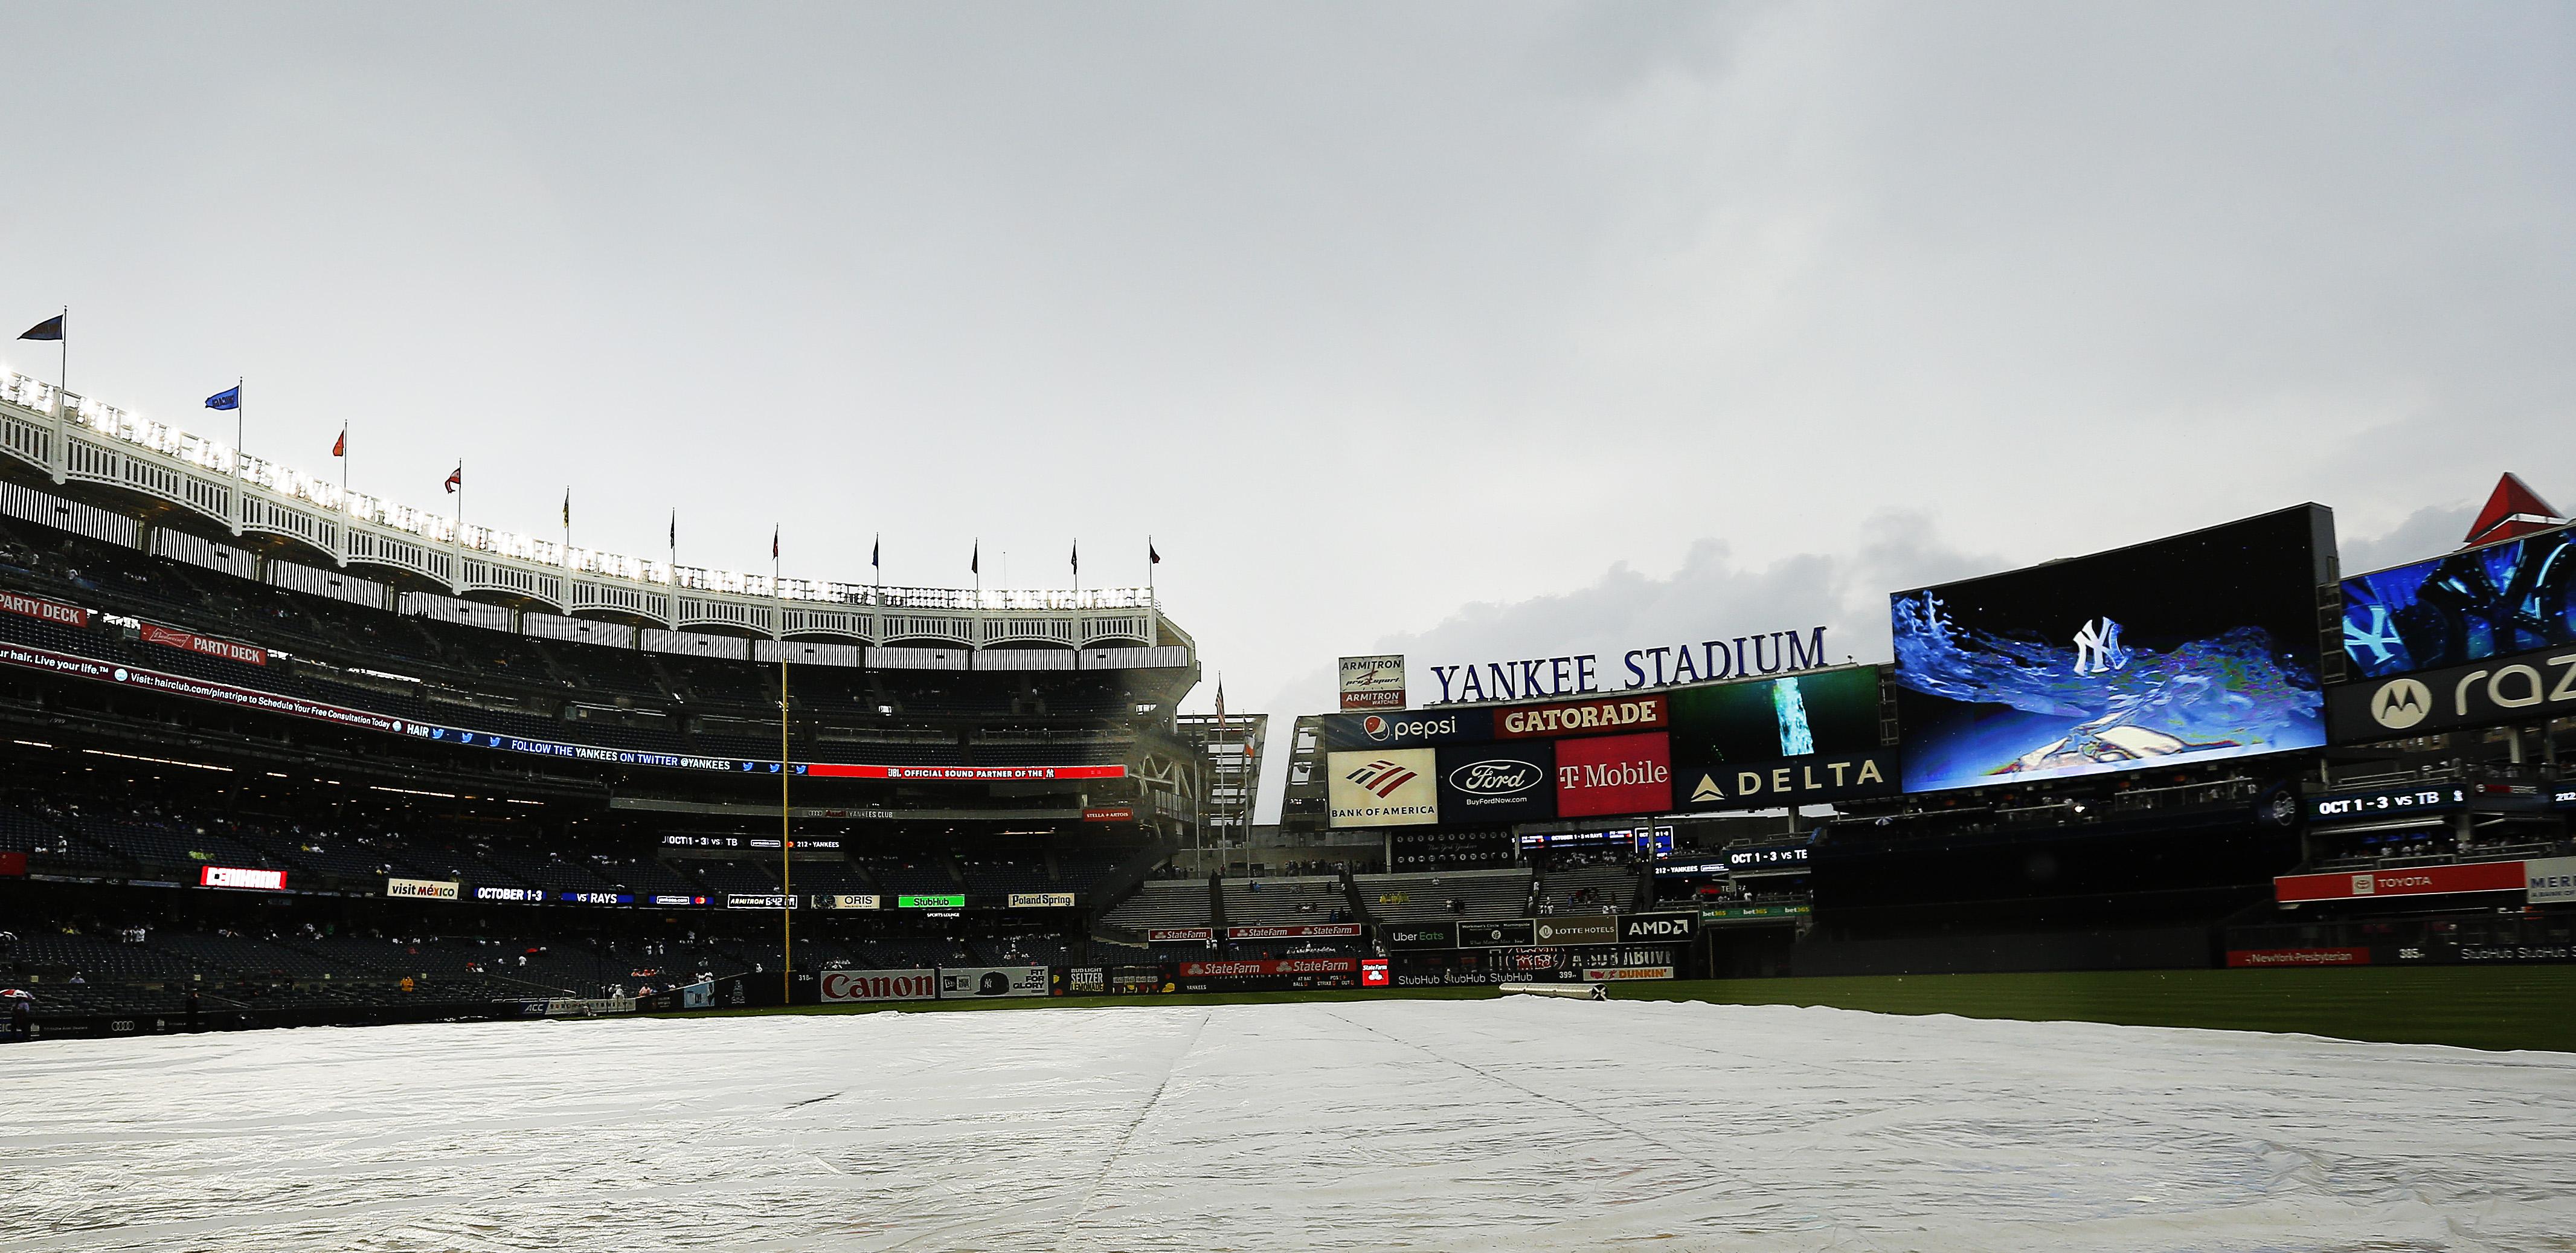 7/3/21 Game Preview: New York Mets at New York Yankees